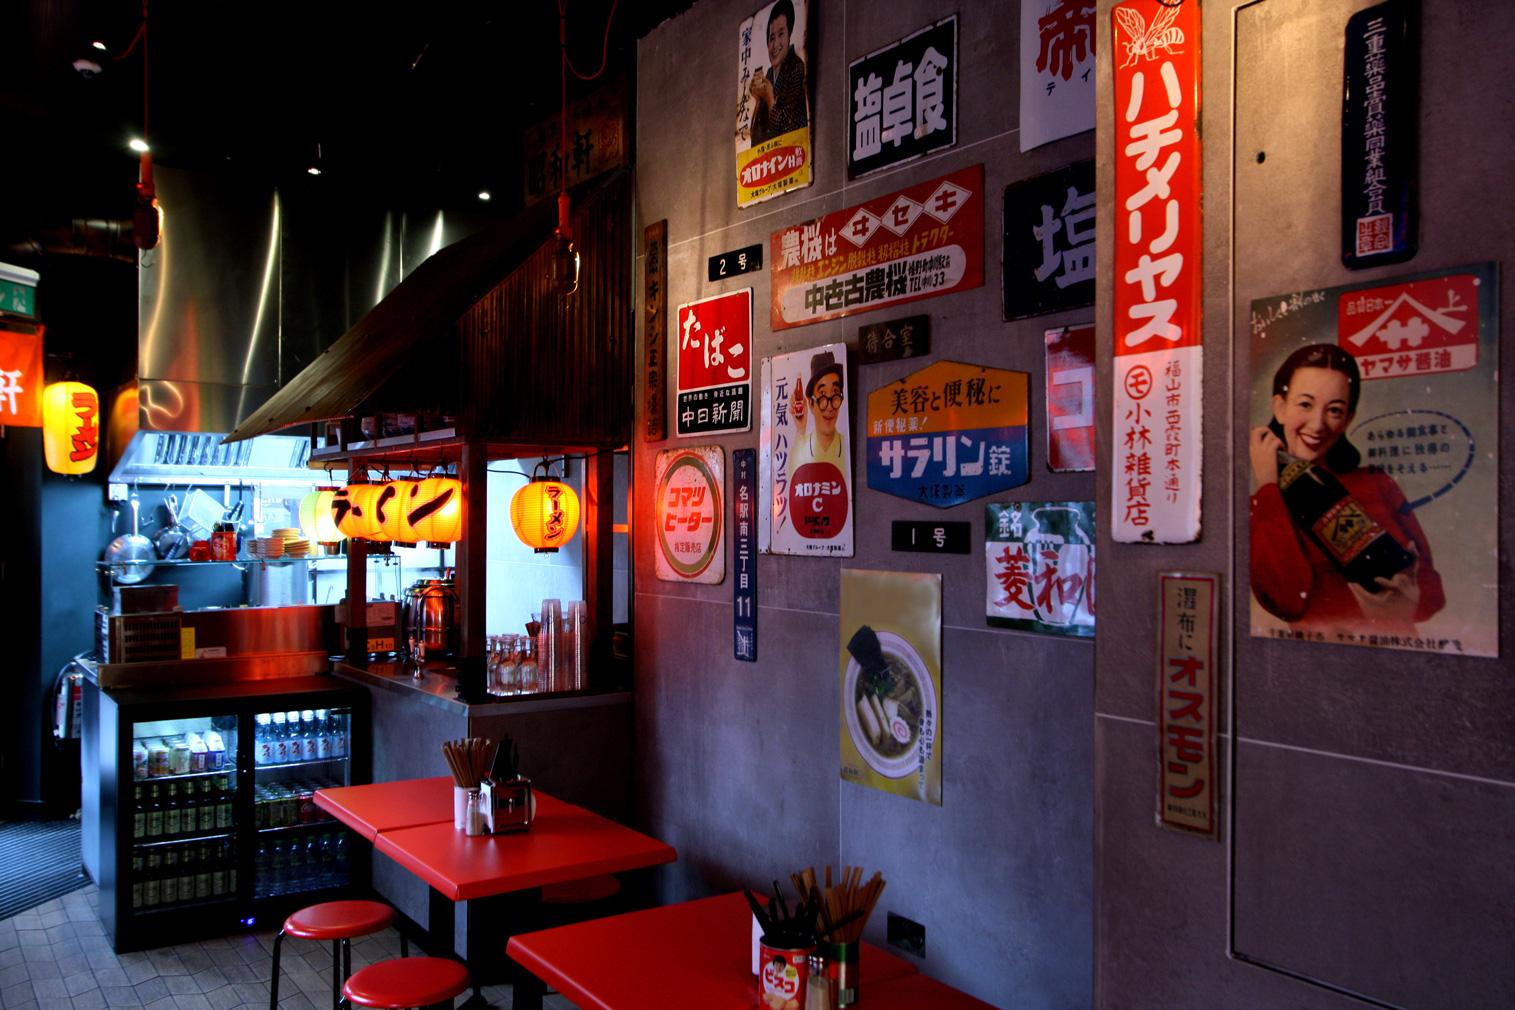 London's retro Showaken ramen bar offers a taste of 1970s Tokyo